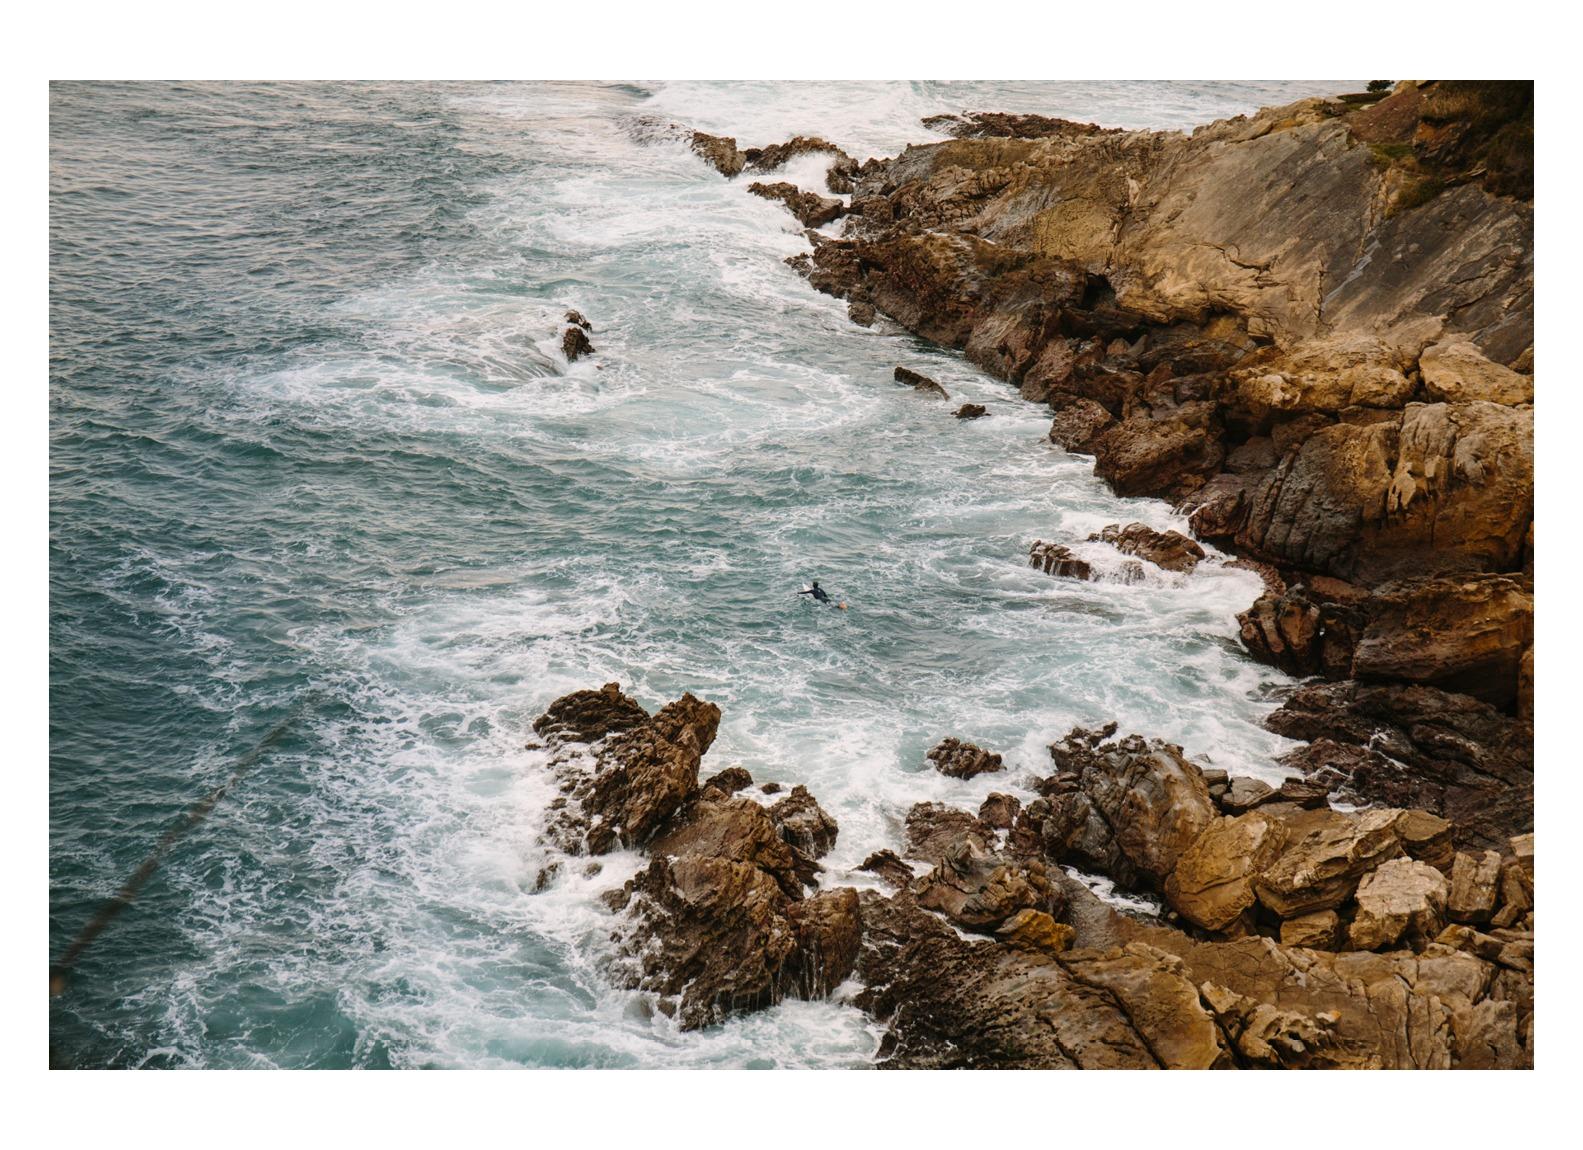 soundofsurfing-bruma2